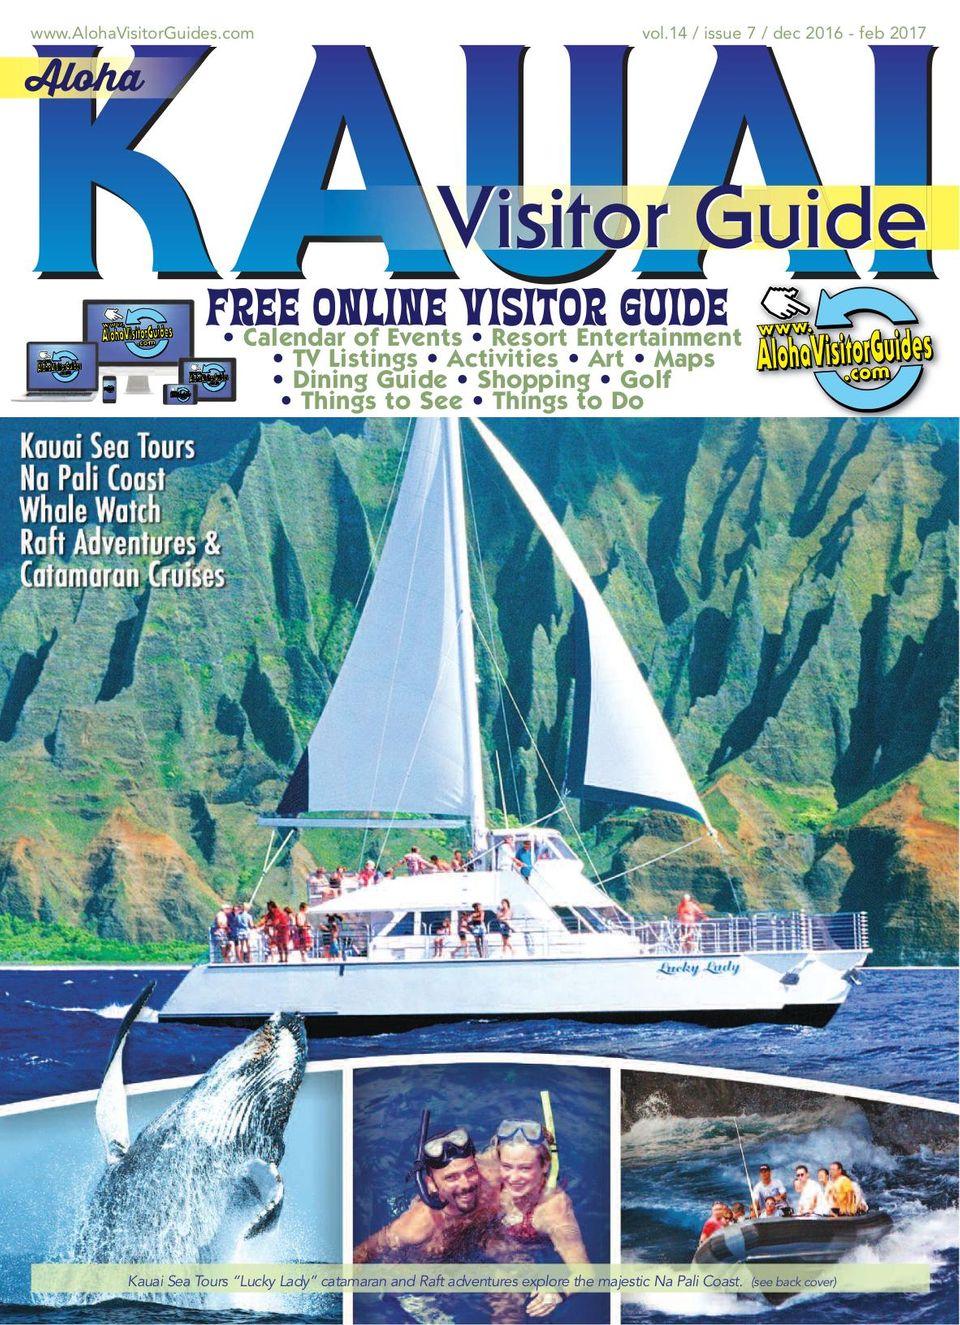 Get Your Digital Copy Of Aloha Kauai Visitor Guide December 2016 Issue